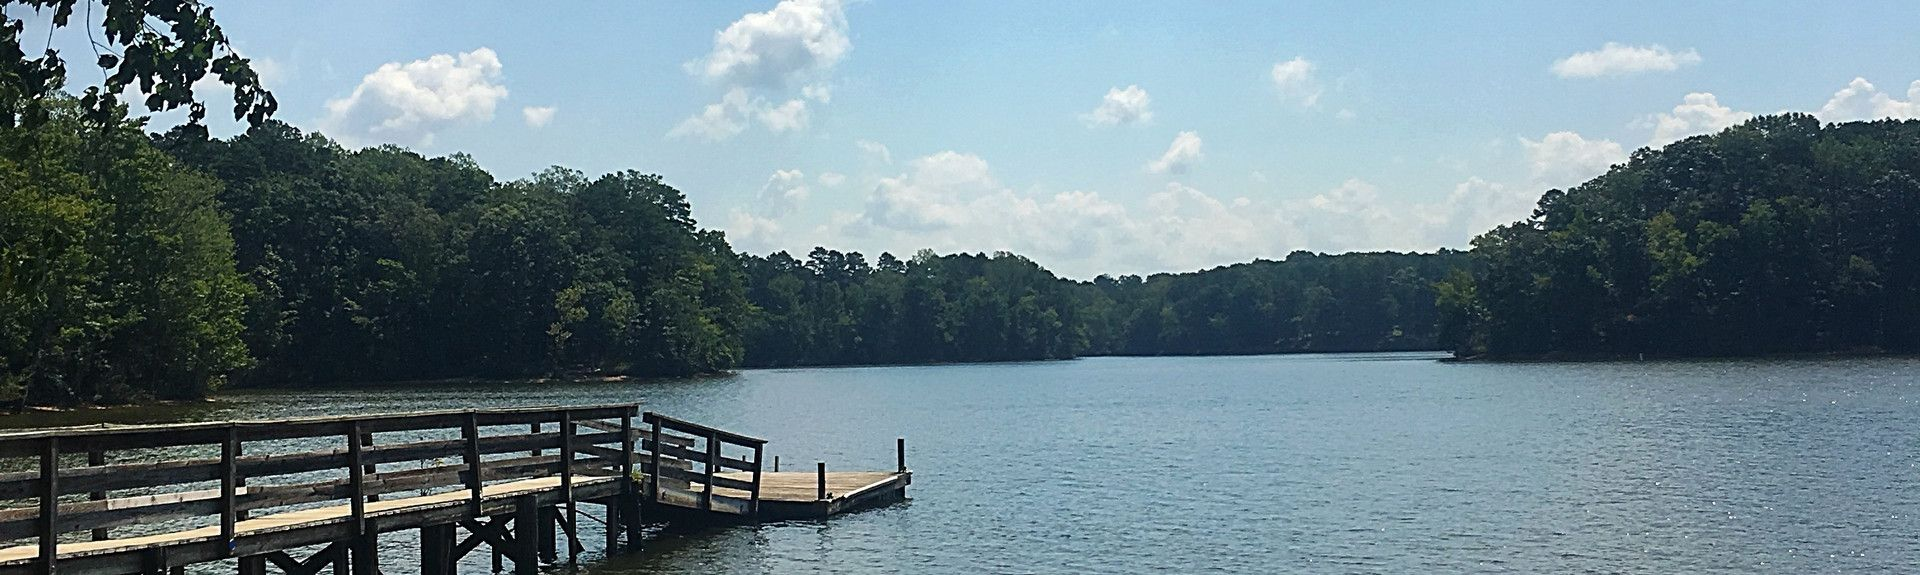 High Rock Lake, Lexington, North Carolina, United States of America